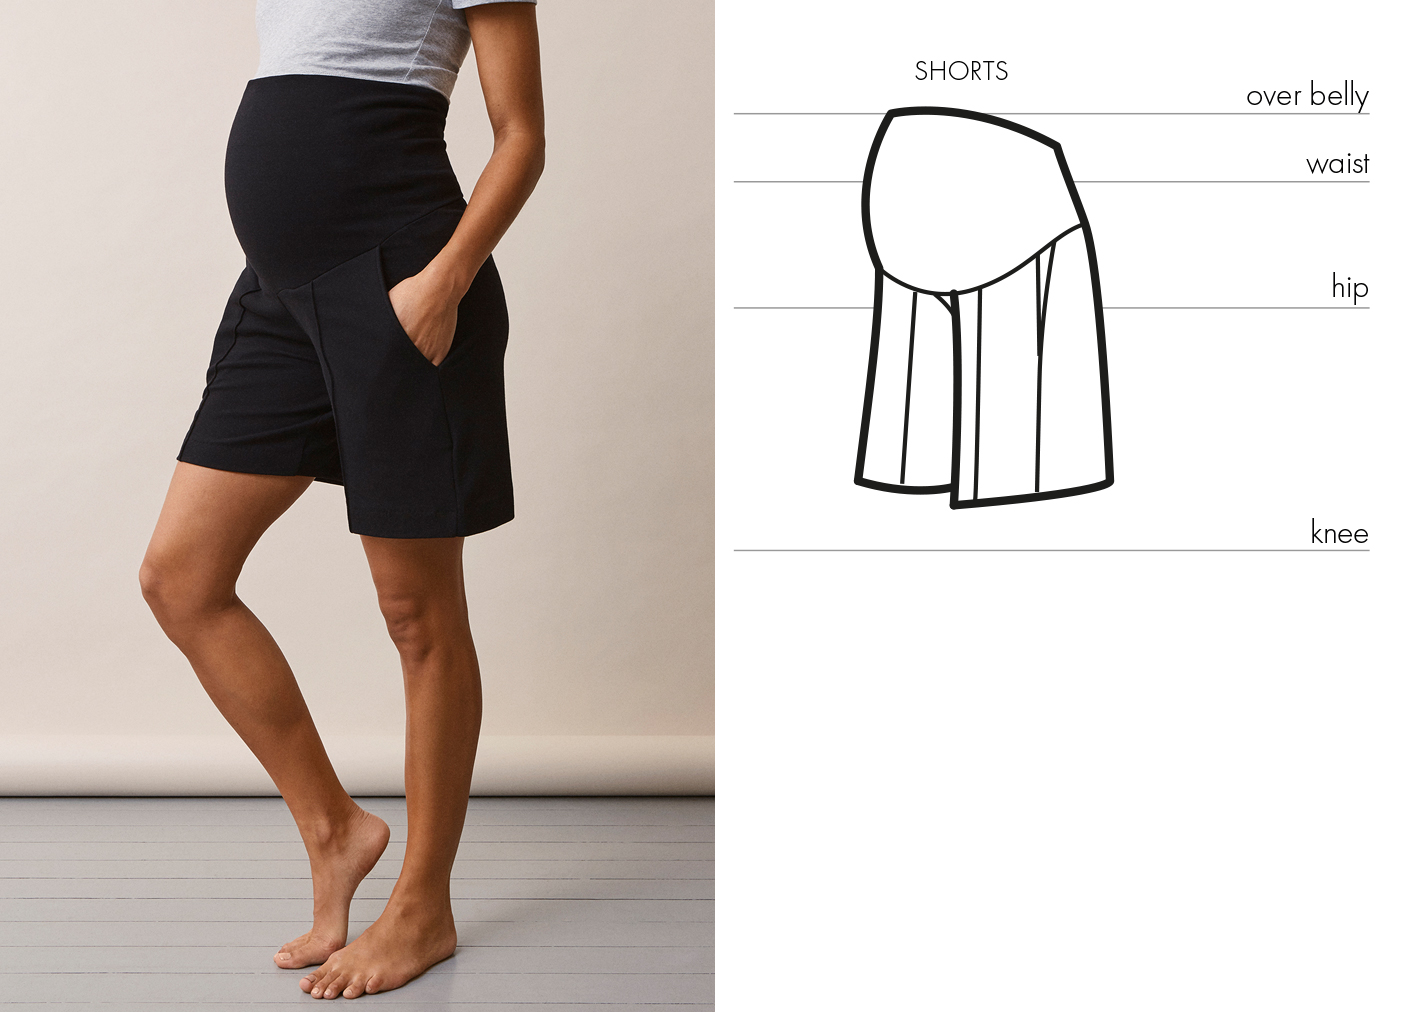 8-Shortss.jpg